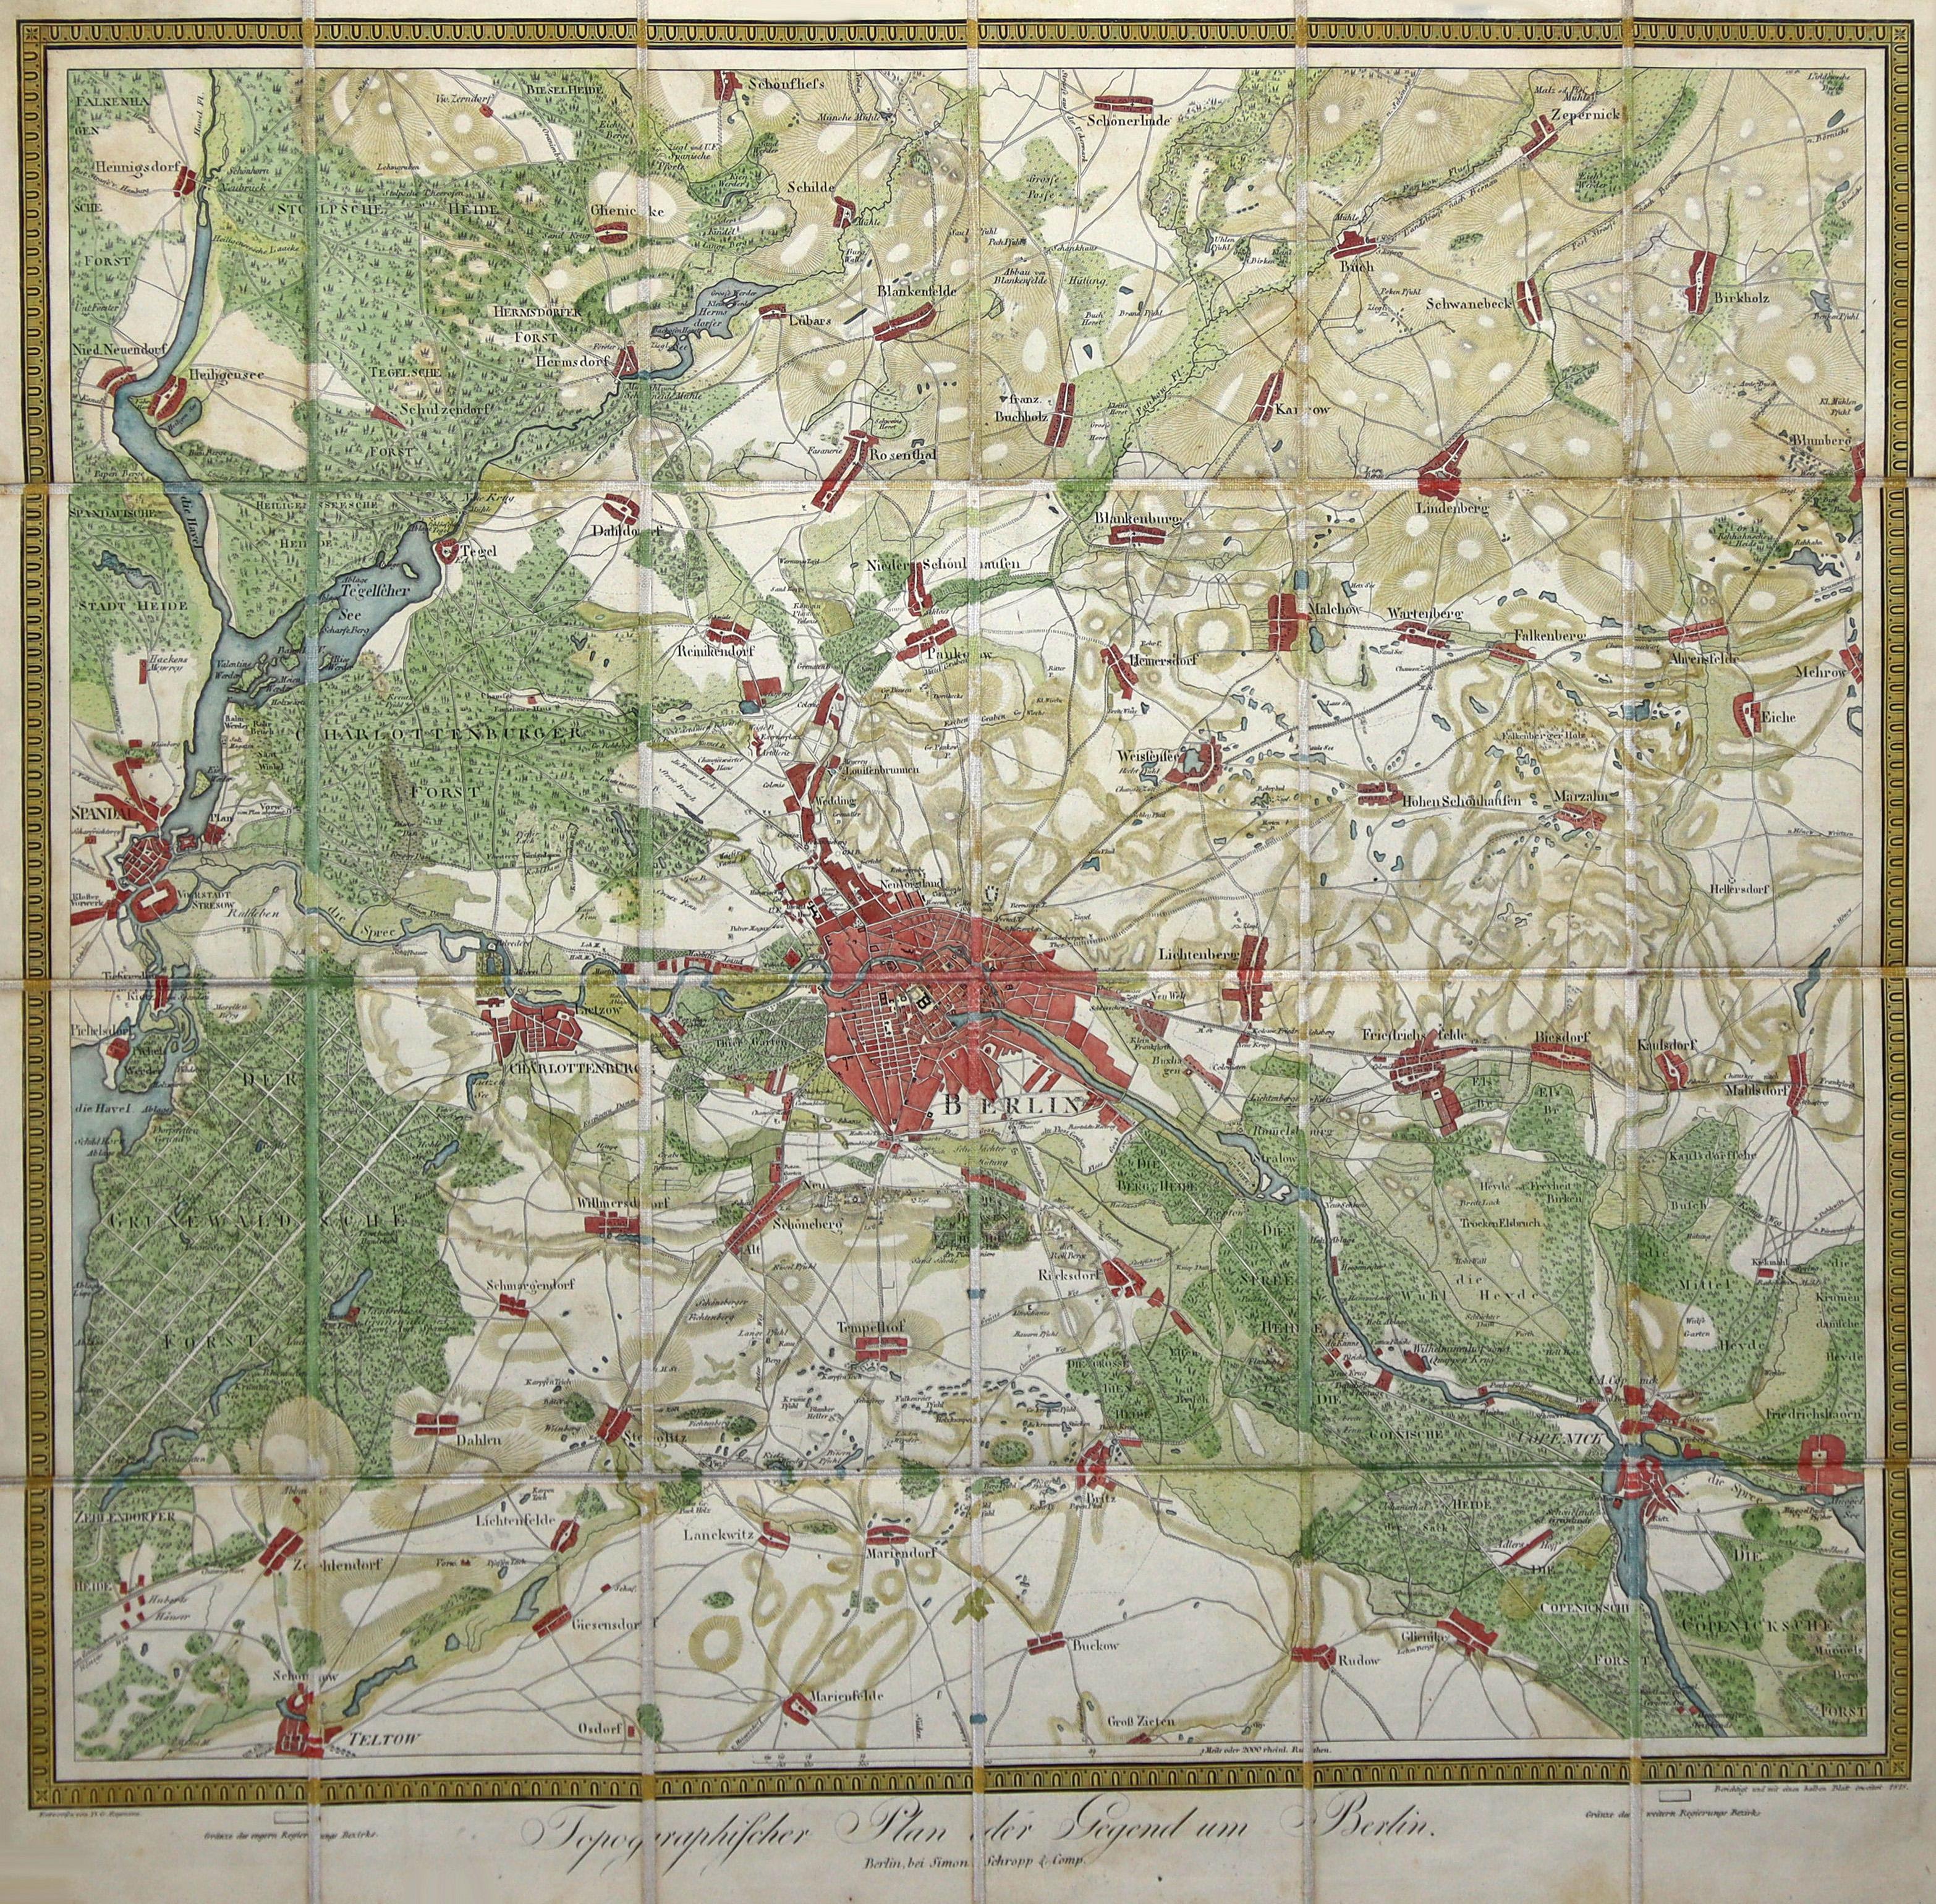 Topographischer Plan der Gegend um Berlin. Entworfen: Berlin - Umgebungskarte: